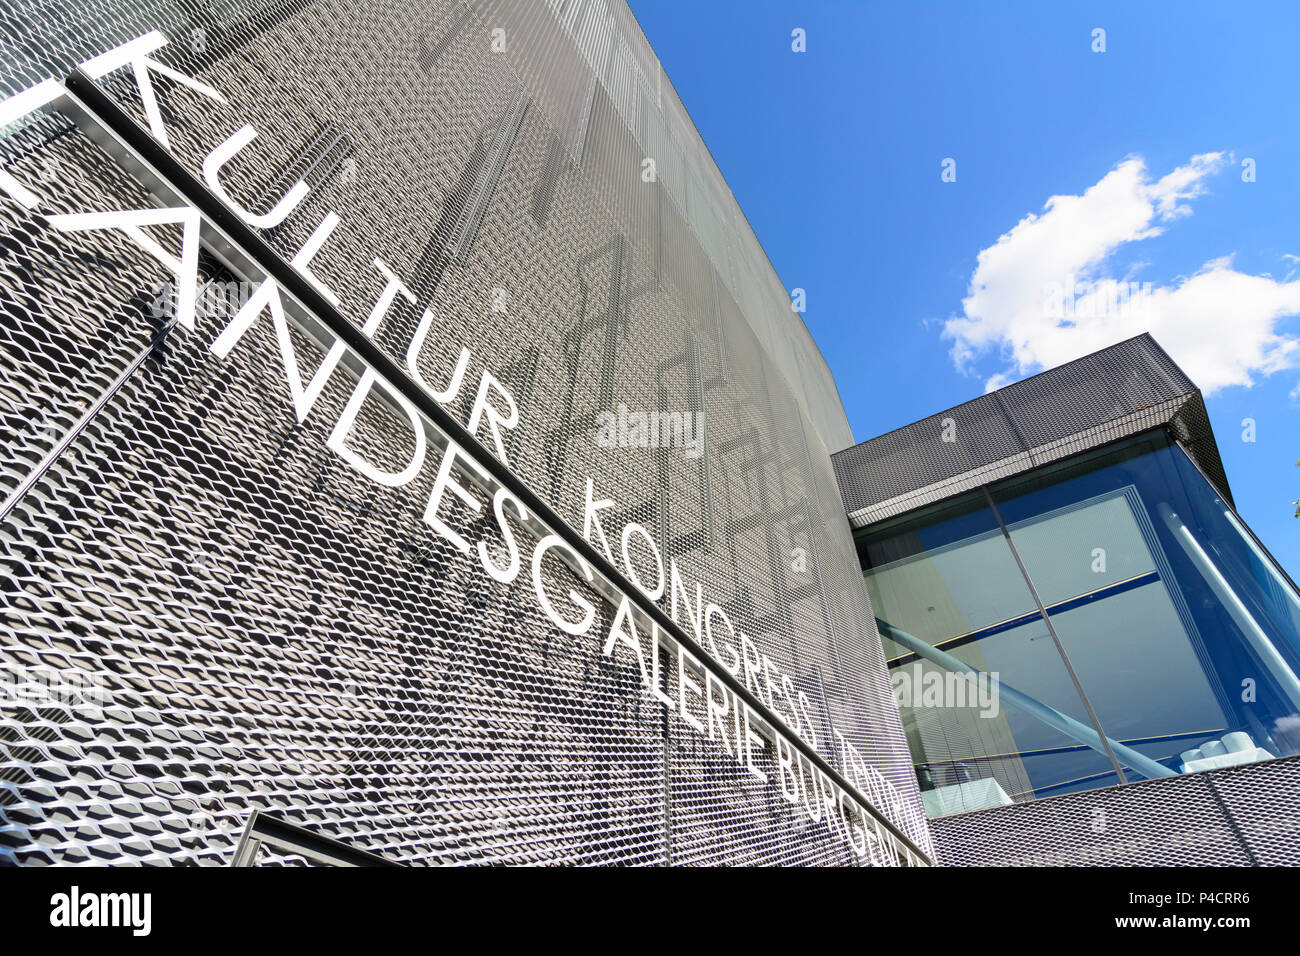 Eisenstadt, Kultur Kongress Zentrum, Kultur Kongresszentrum, Neusiedler See (Neusiedler See), Burgenland, Österreich Stockbild